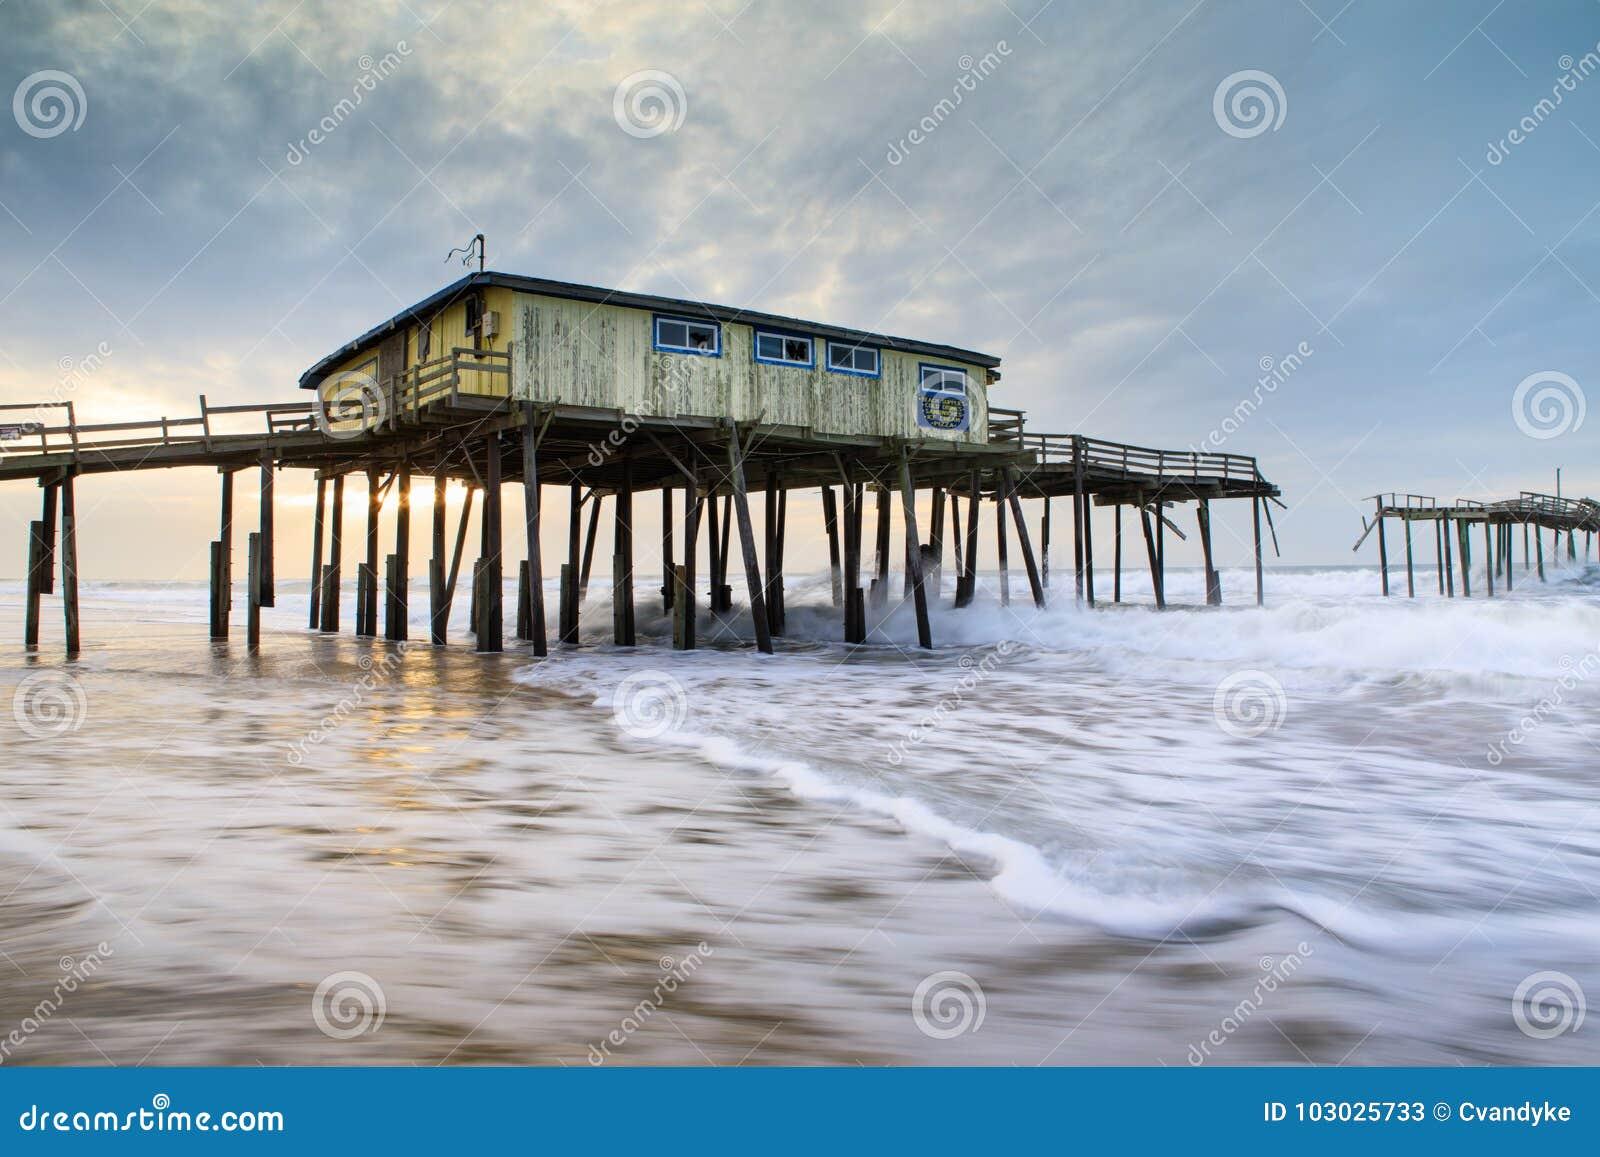 North Carolina Frisco Abandoned Fishing Pier